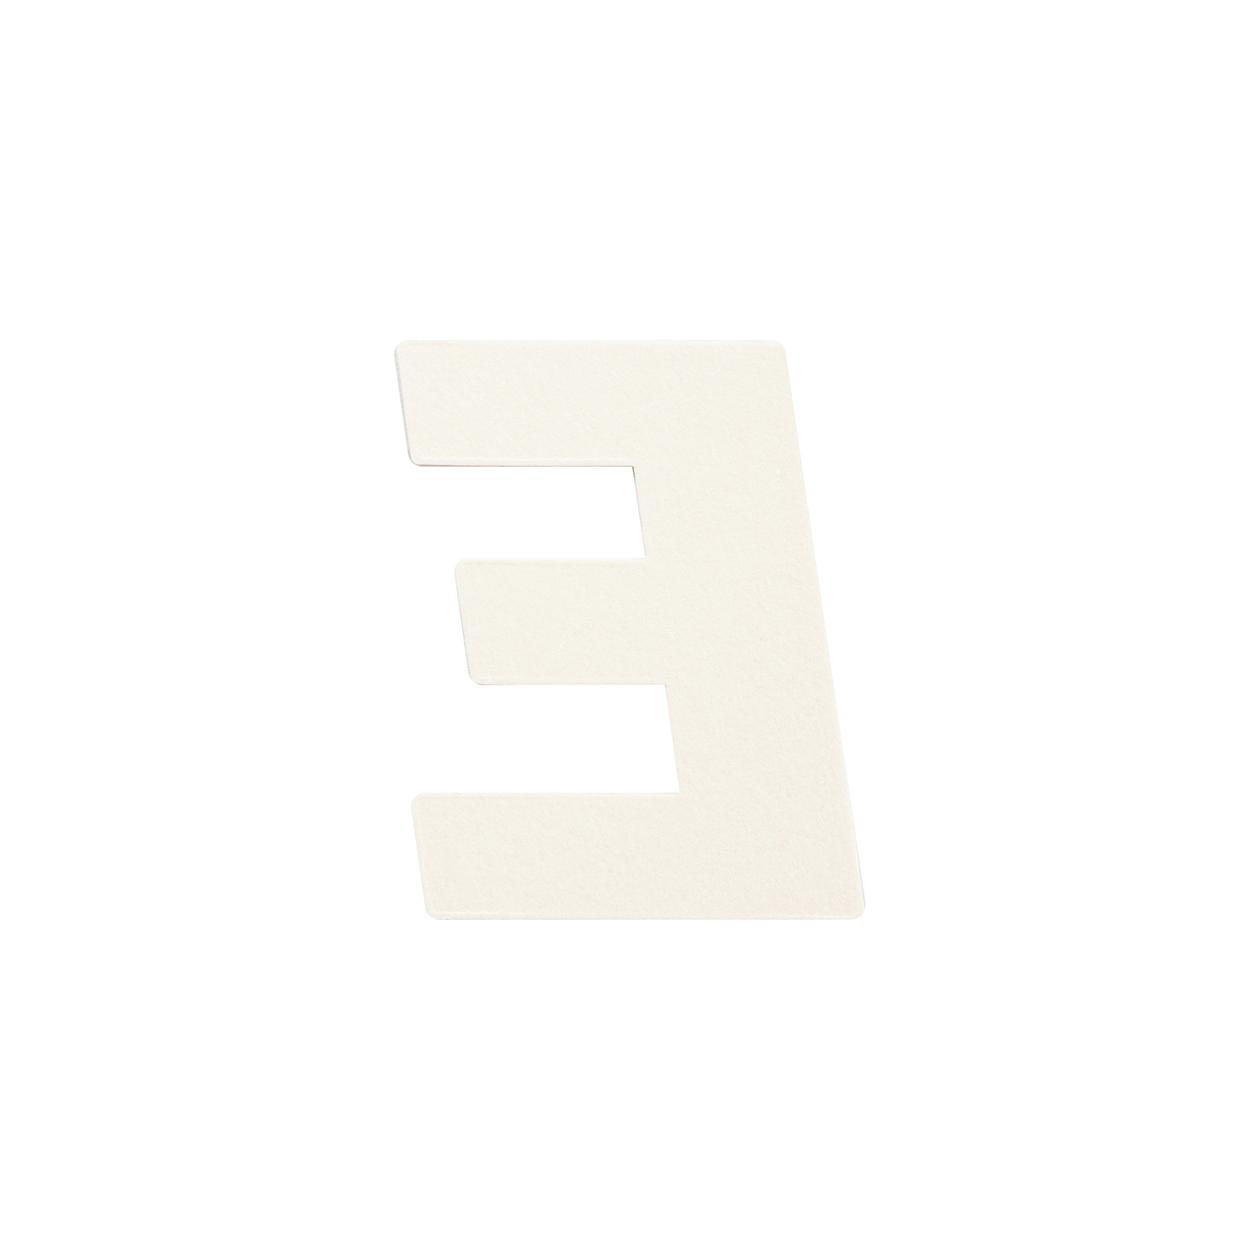 No.395ボード A7カードDC 文字E シルバー